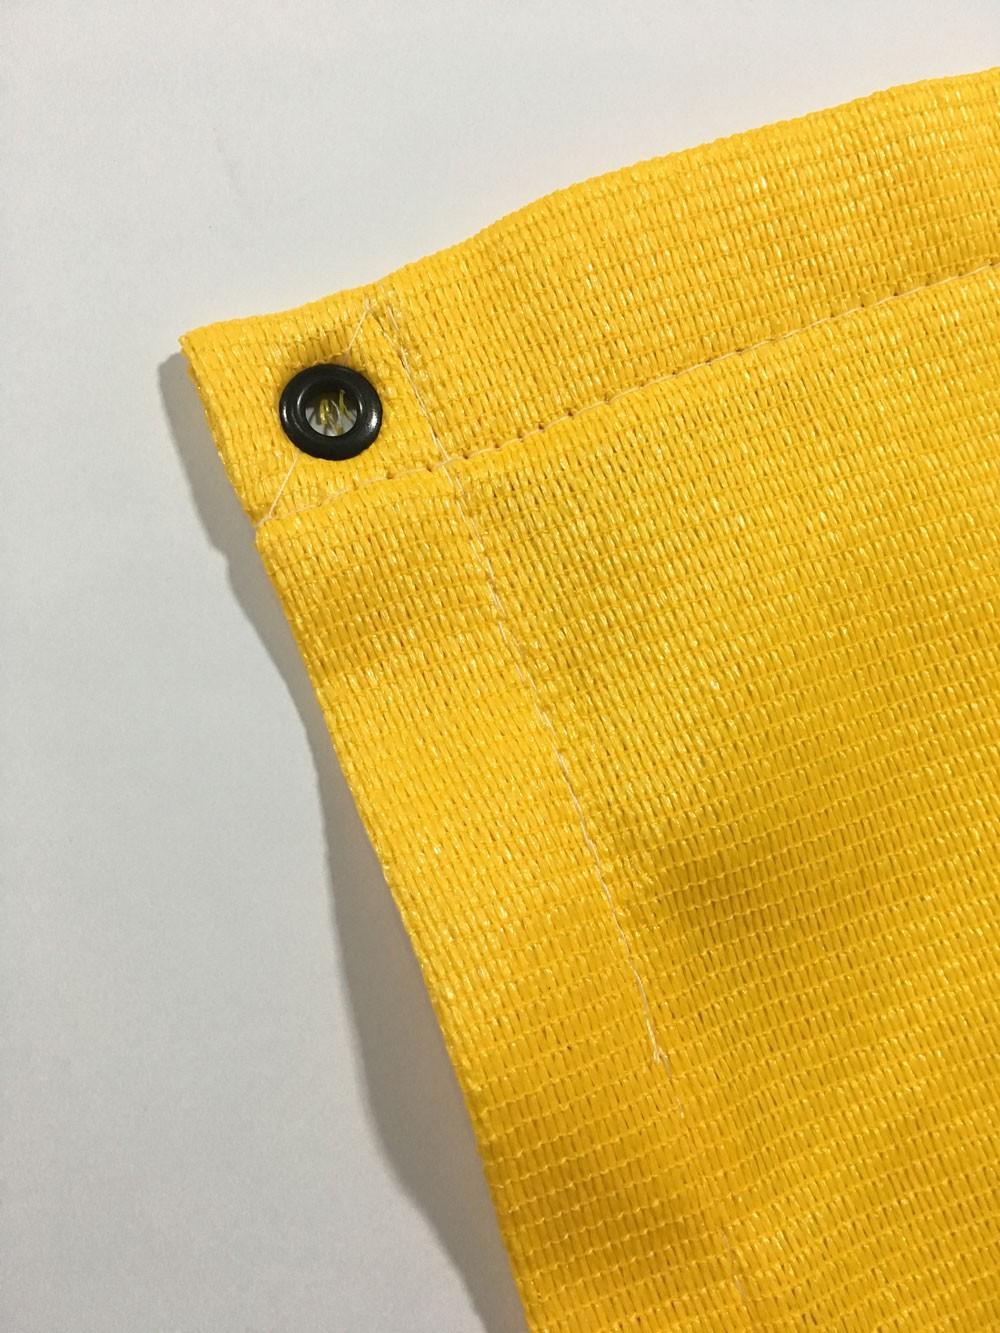 Tela Toldo Sombreamento Shade Amarelo Retangular 3,5x3m